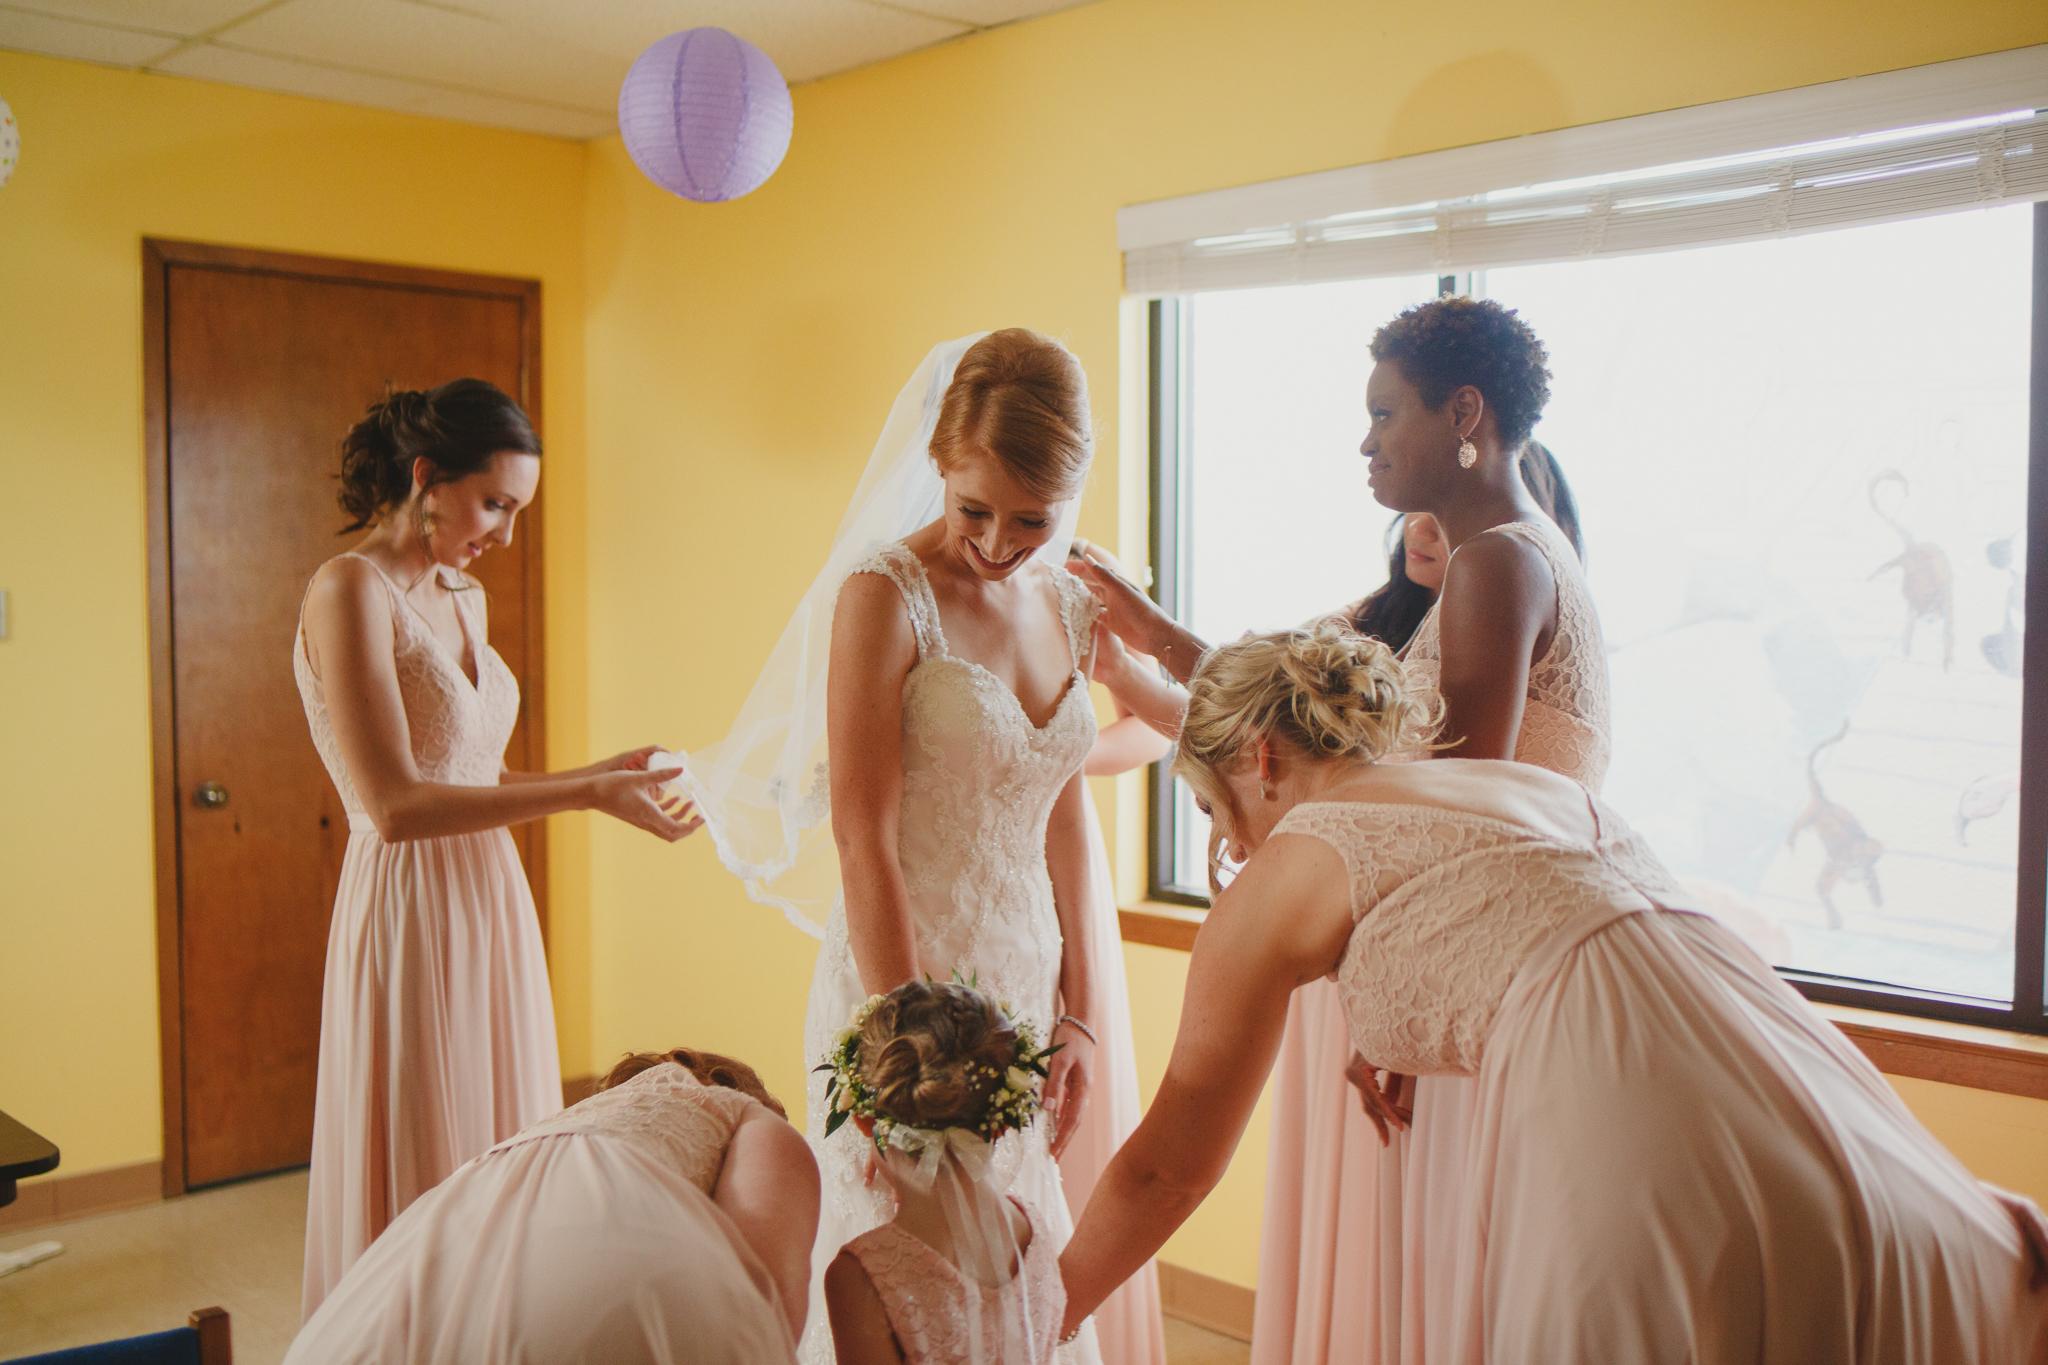 Michael and Kelly - the ashton depot - wedding DFW - wedding photographer- elizalde photography (7 of 150).jpg